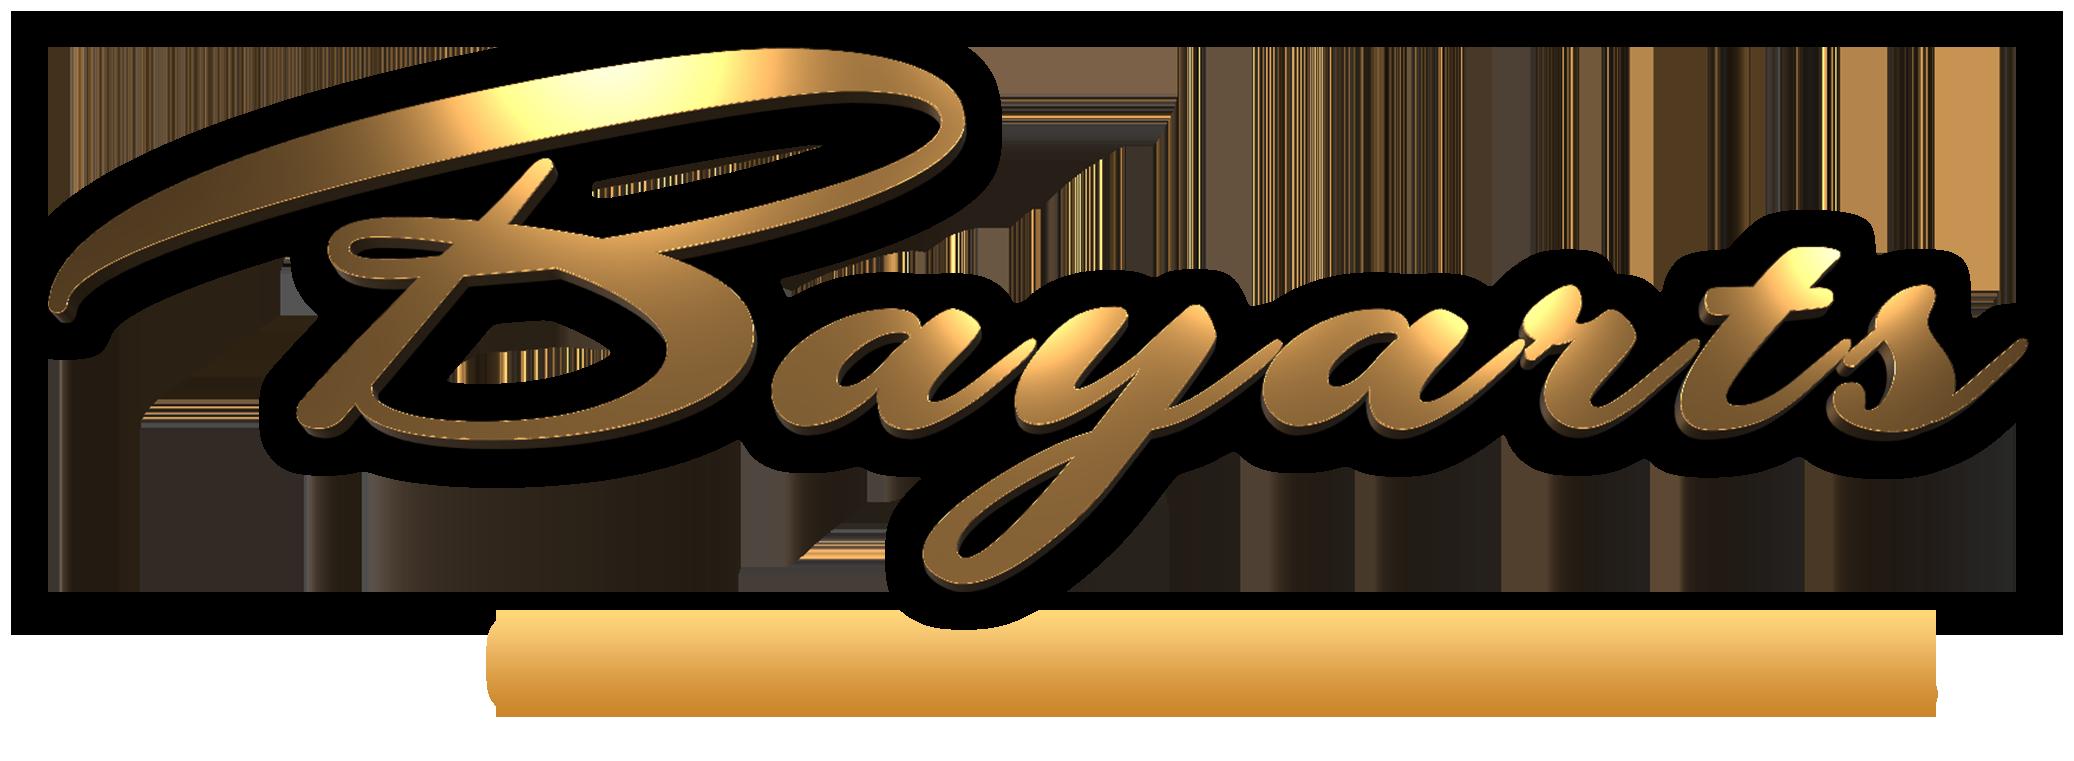 Bayarts Cookies and Chocolates